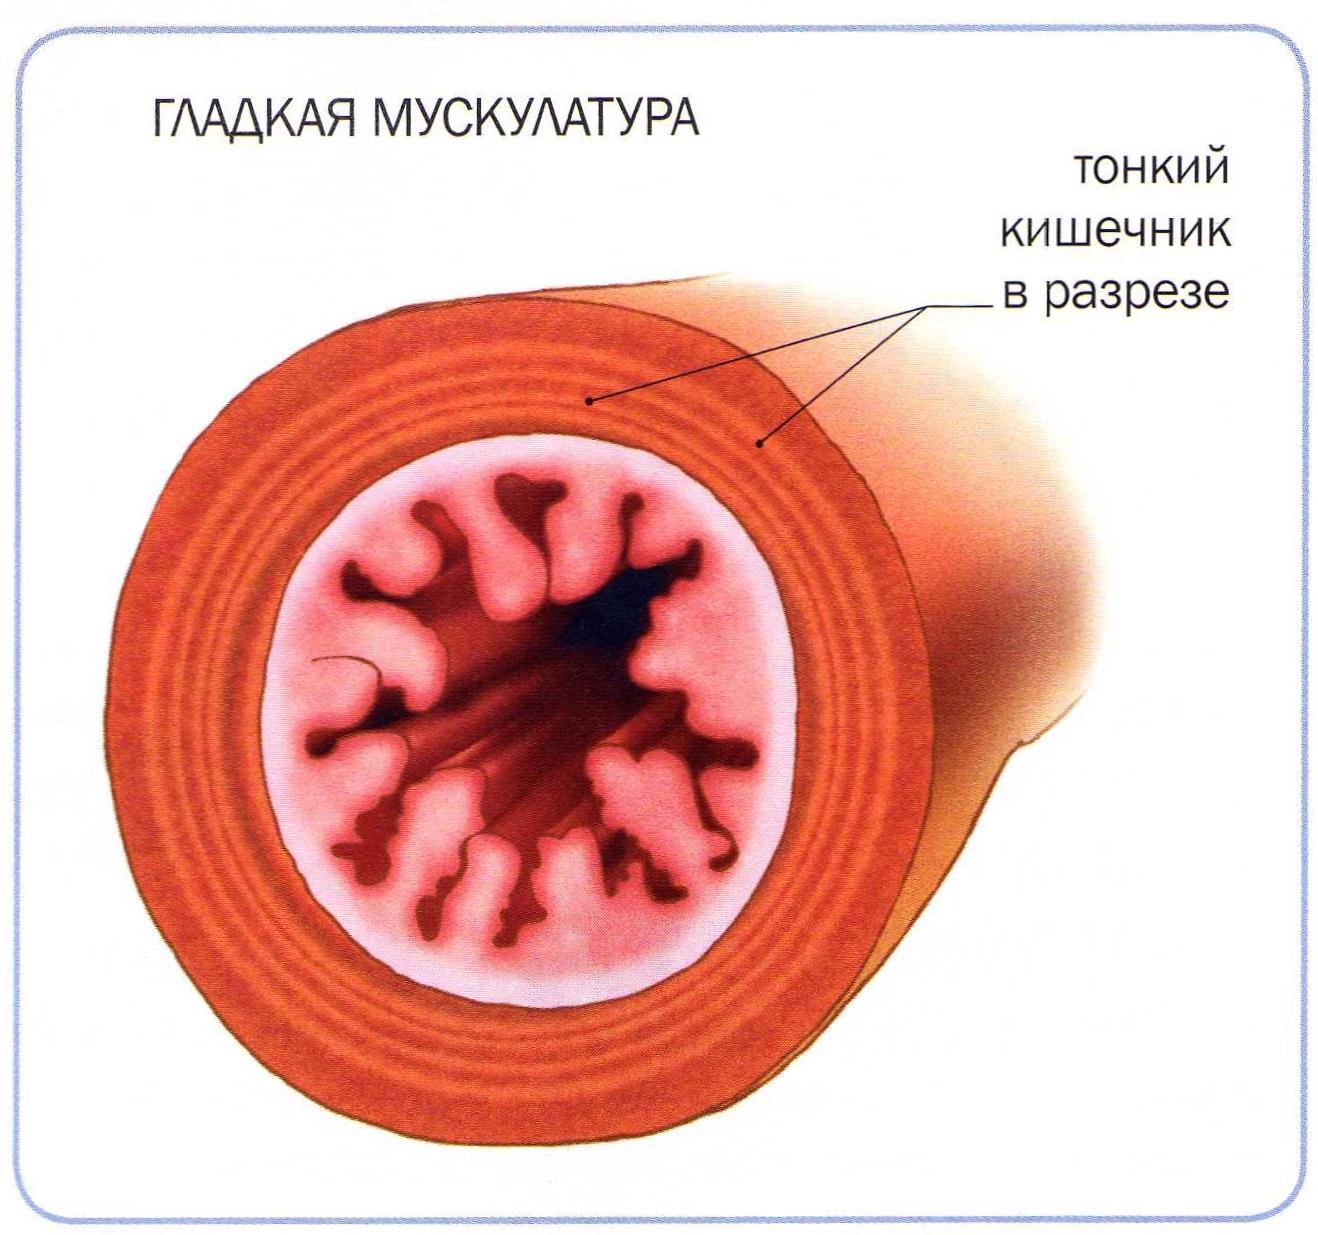 gladkaya-muskulatura